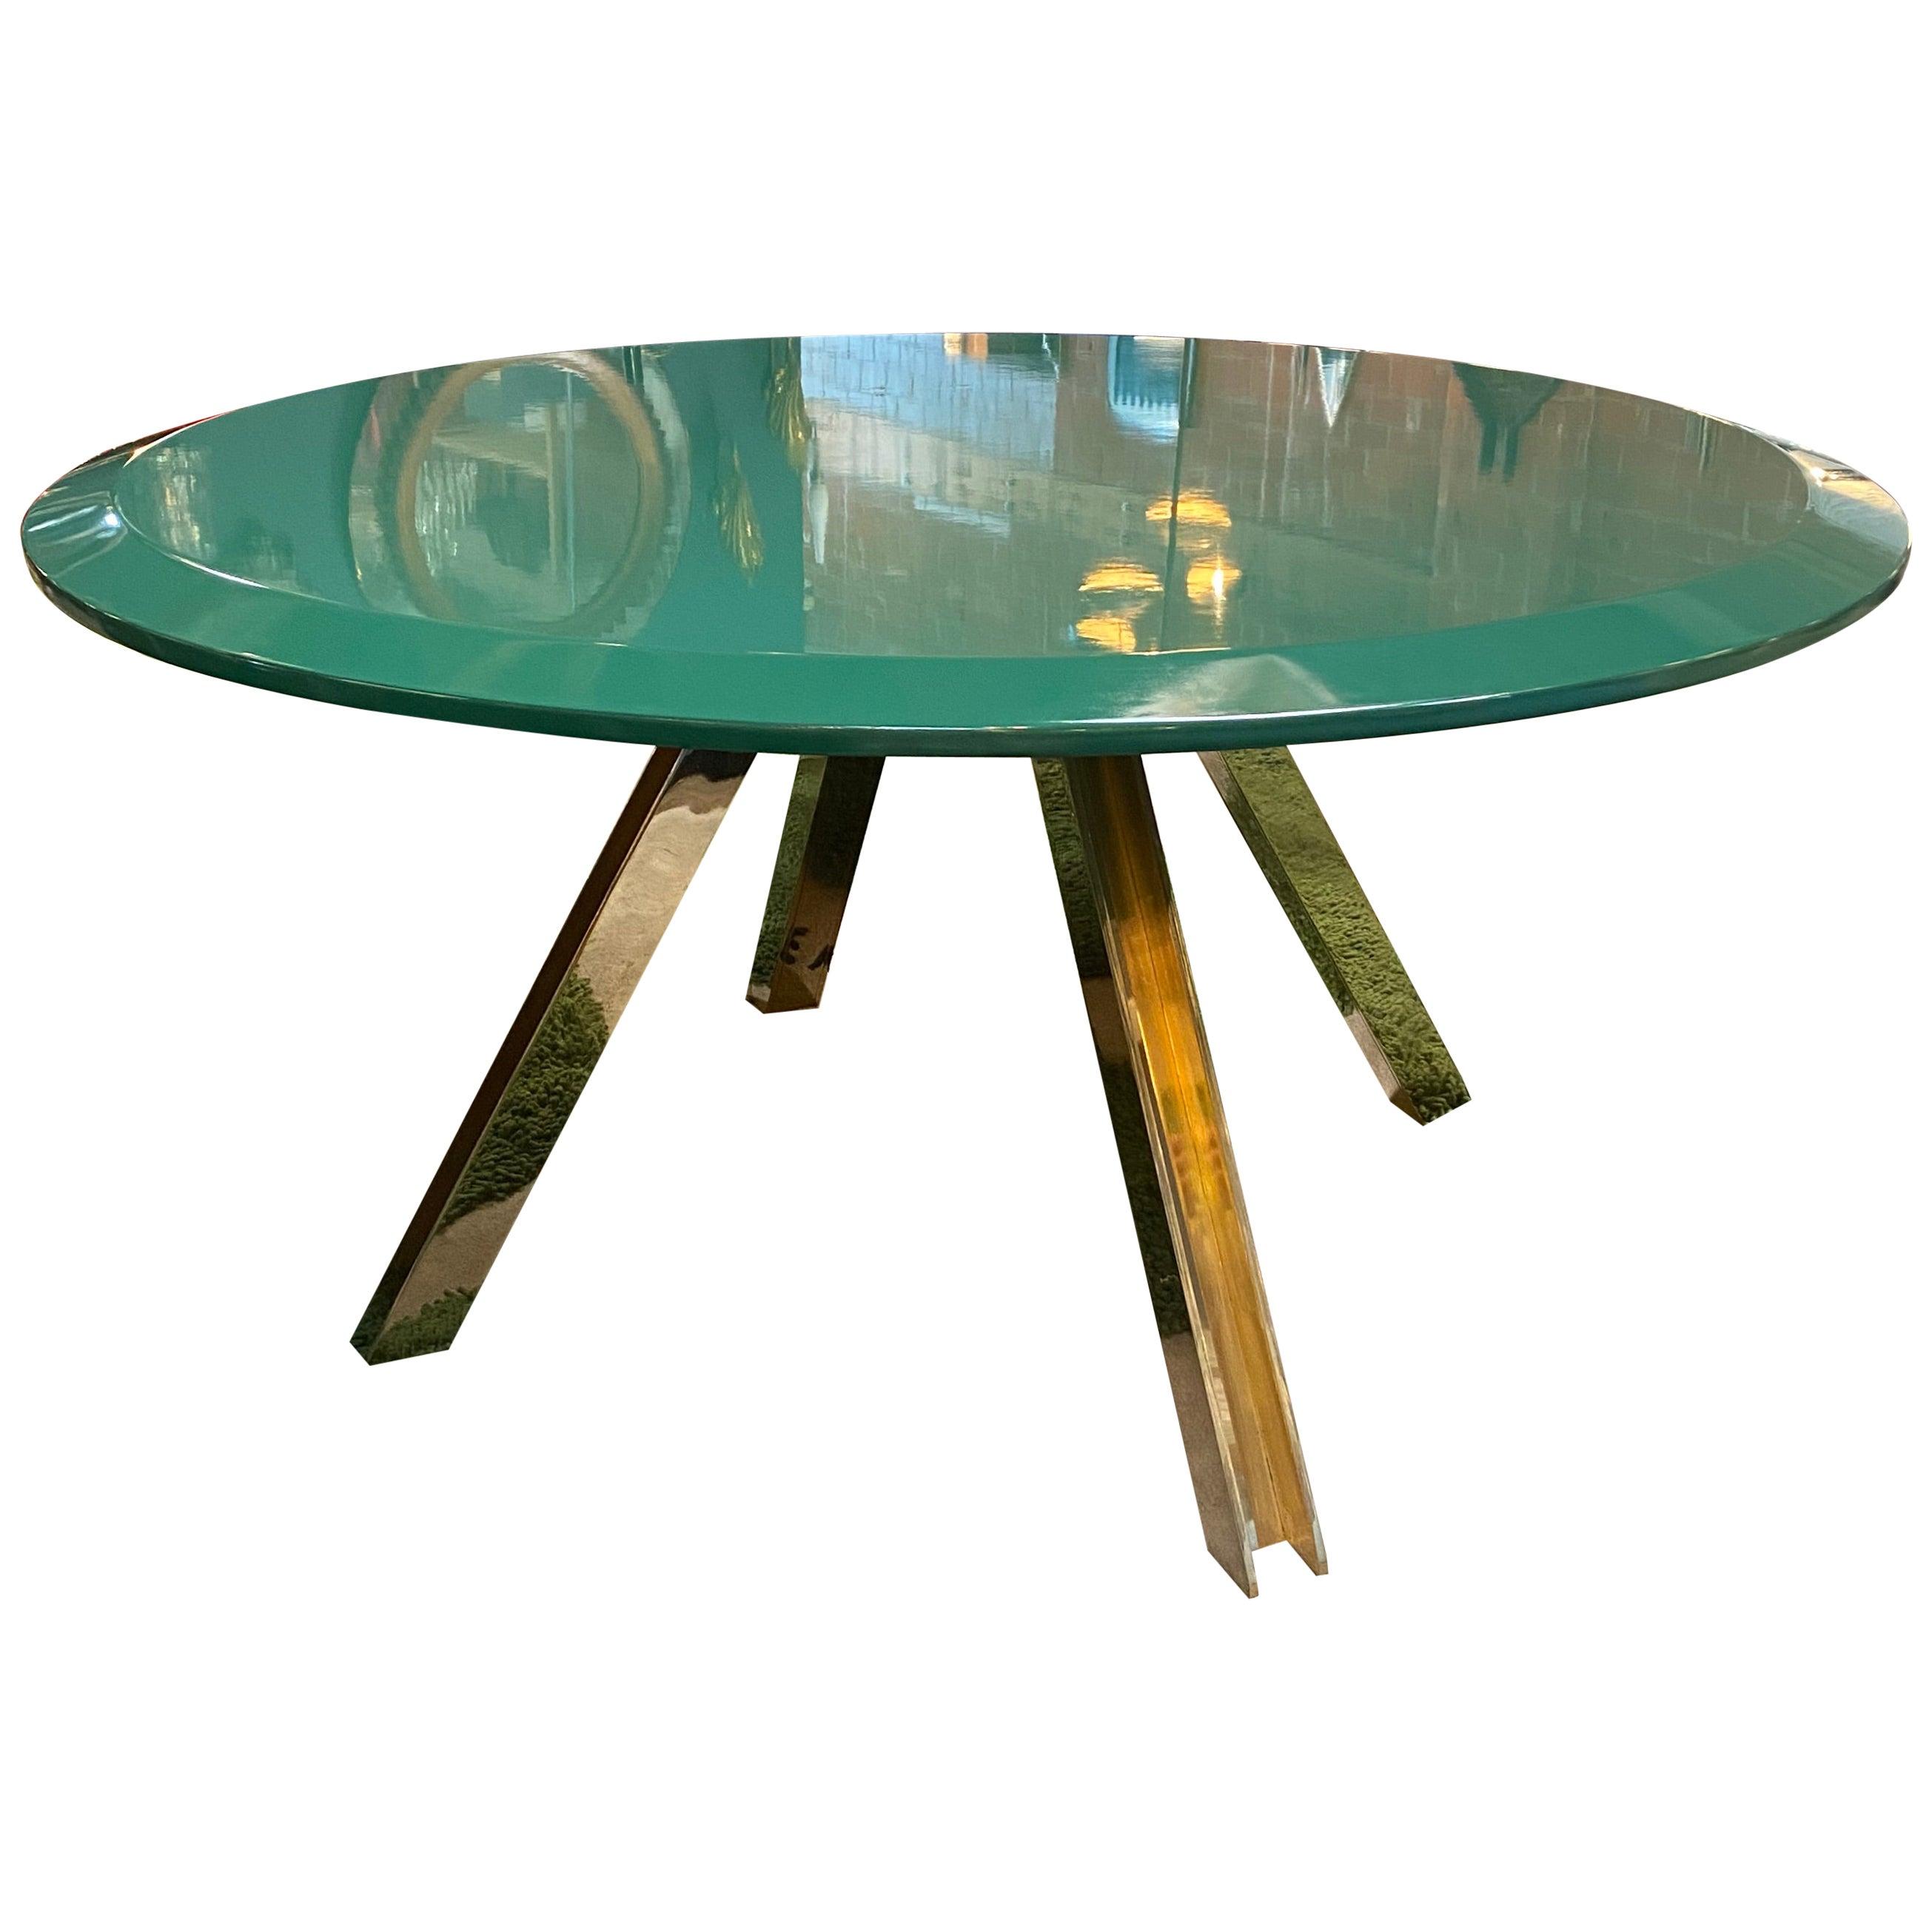 Romeo Rega Attribute Brass Round Green Top Centre Table, Italy, 1970s